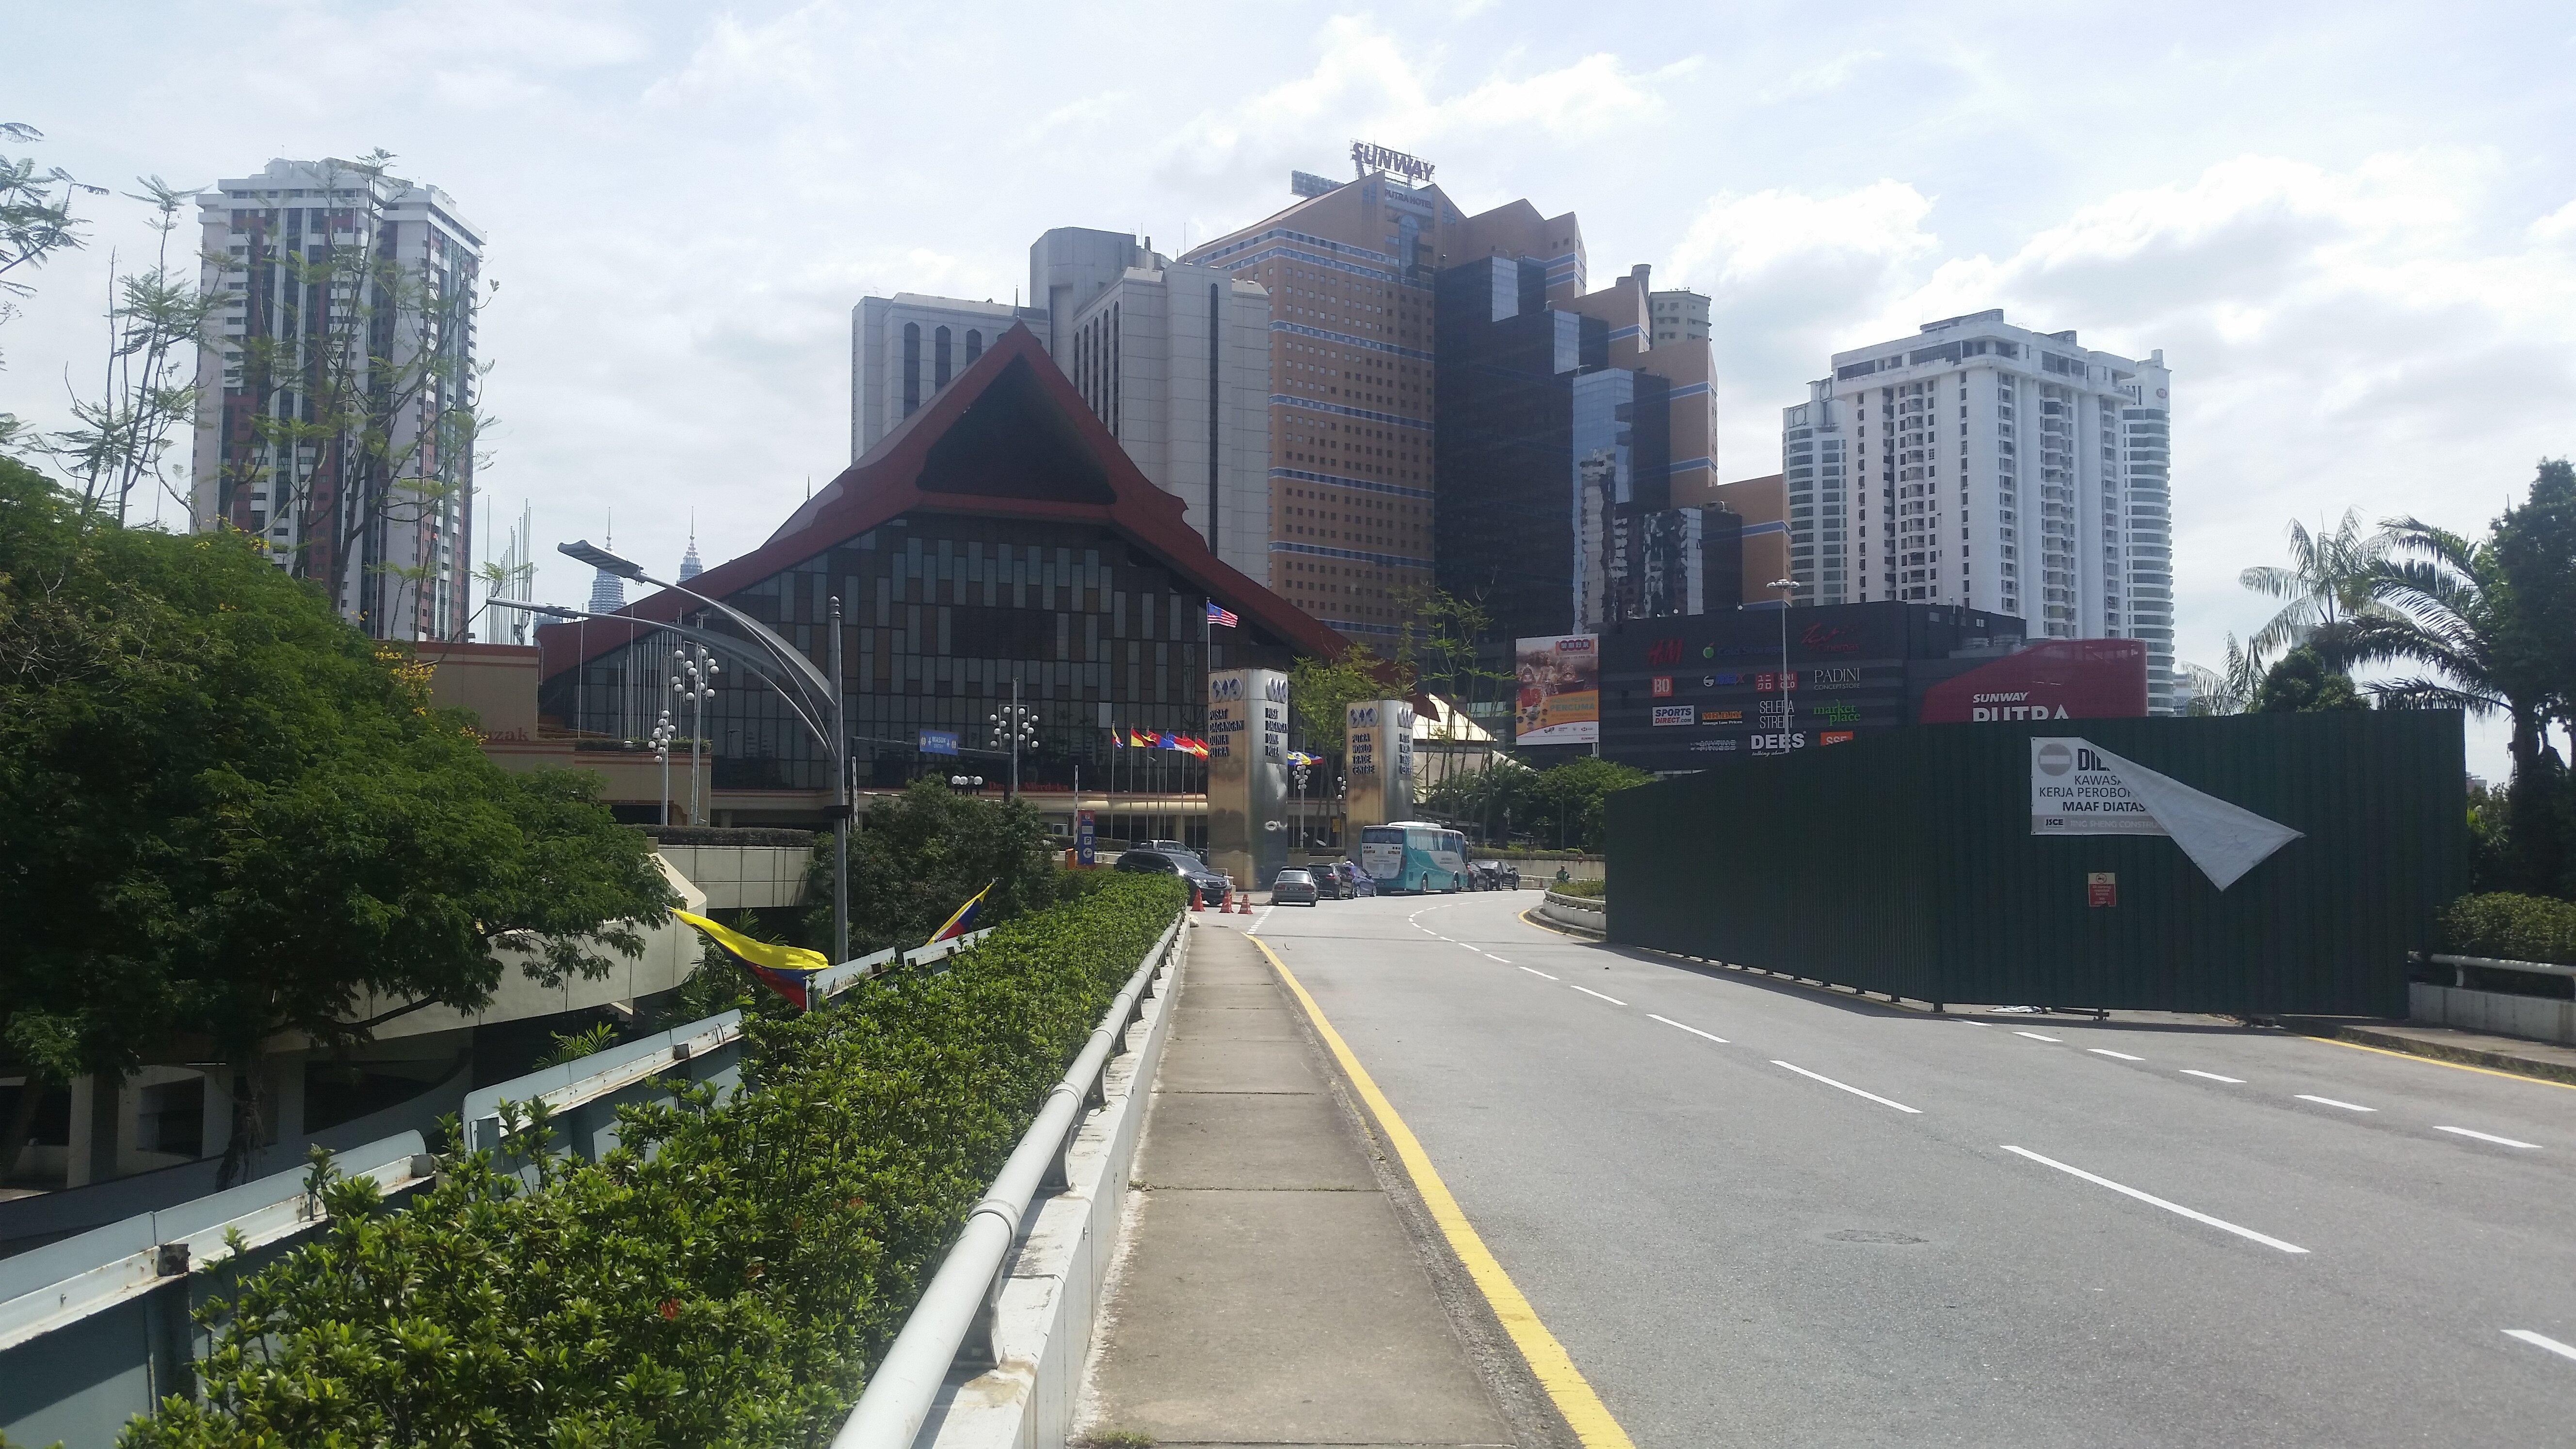 Sunway Putra Mall.